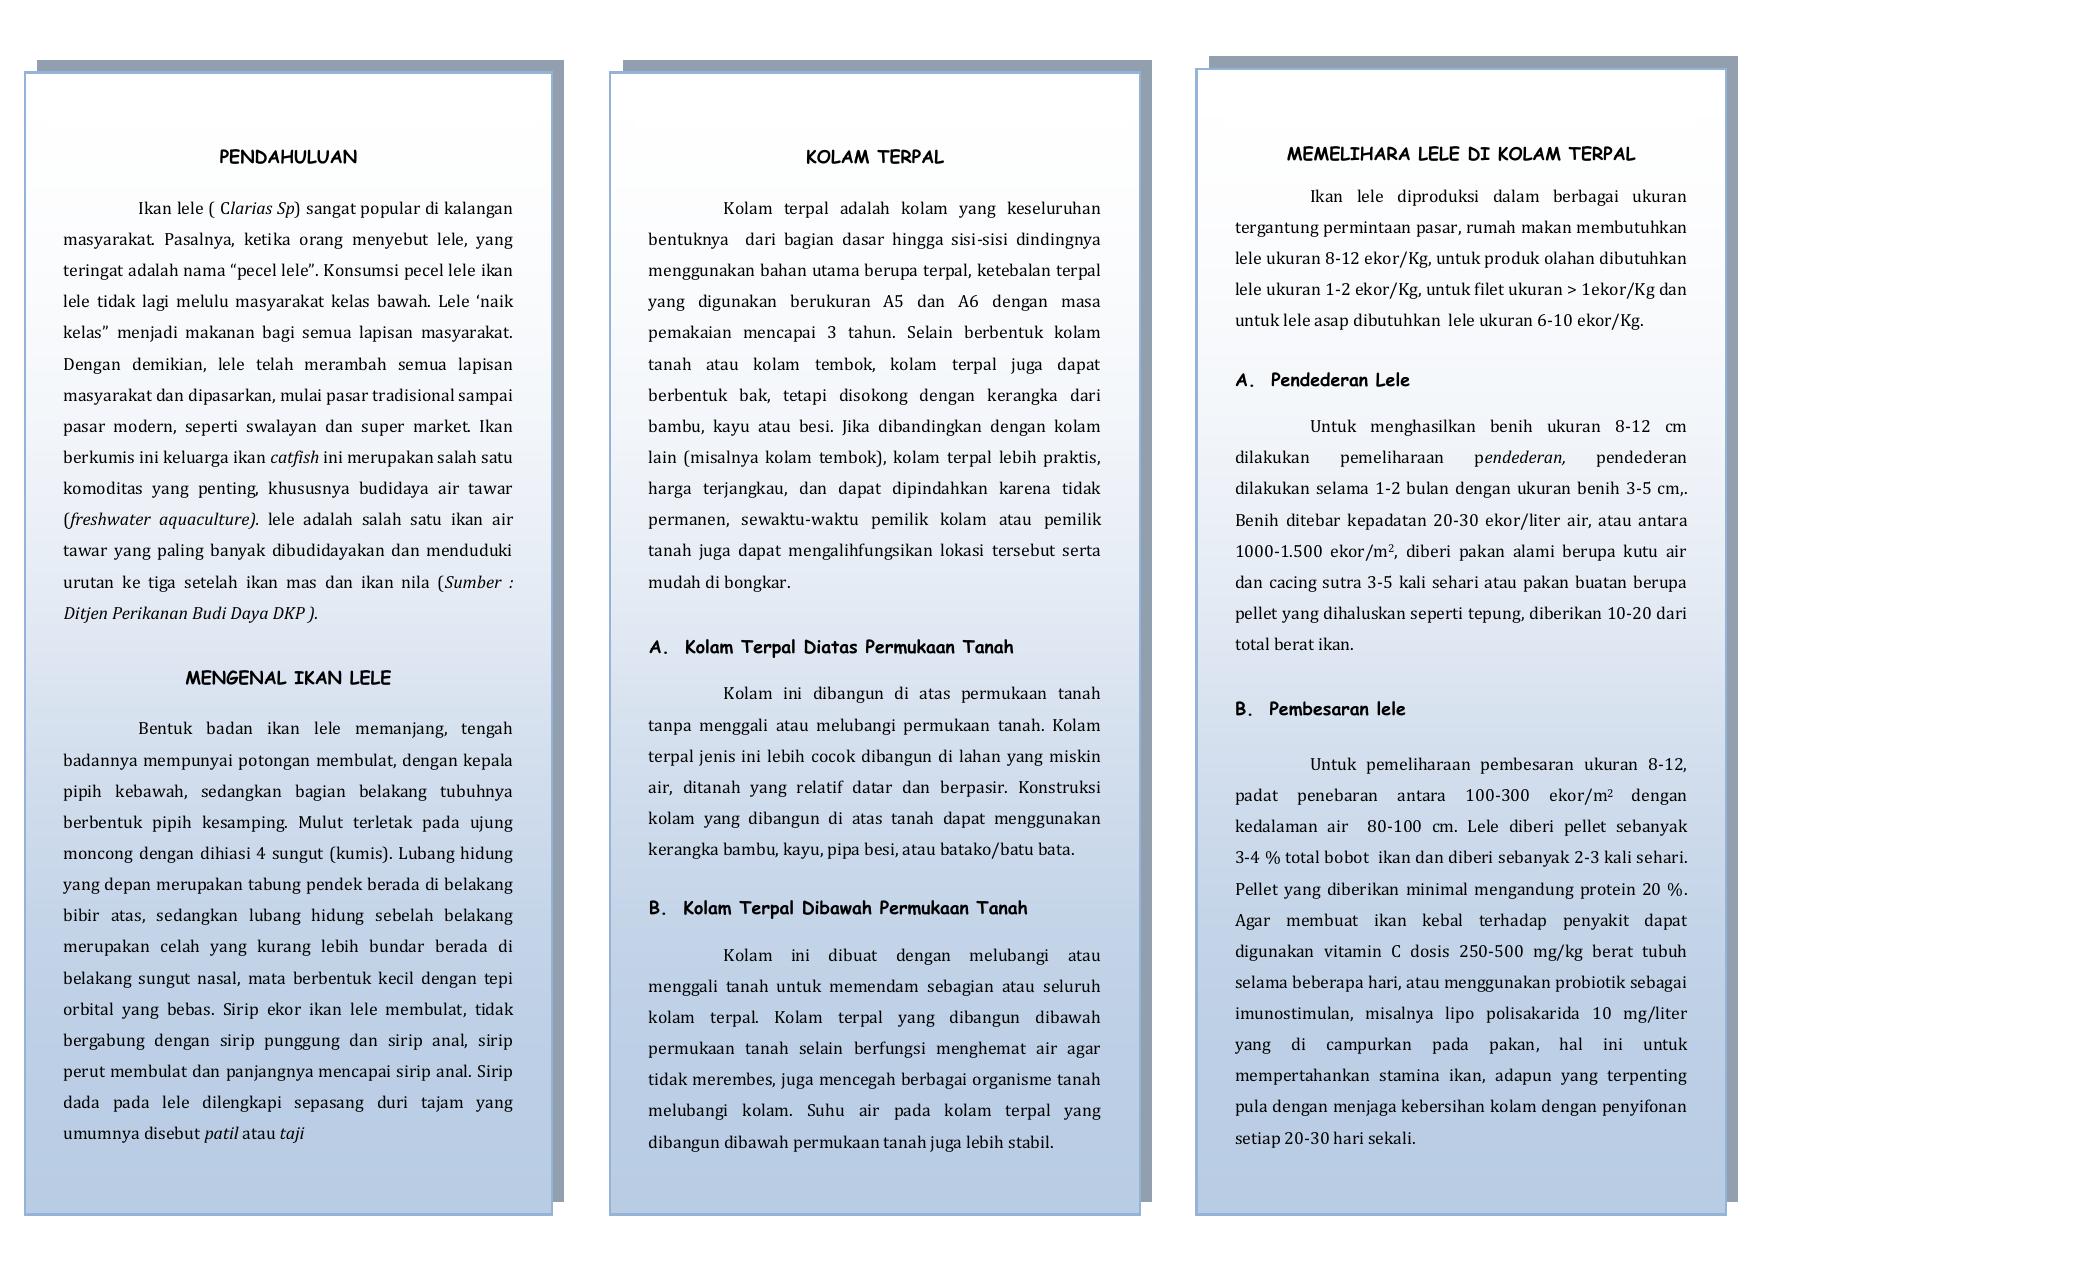 Contoh Proposal Budidaya Ikan Lele Kolam Terpal Berbagi Contoh Proposal